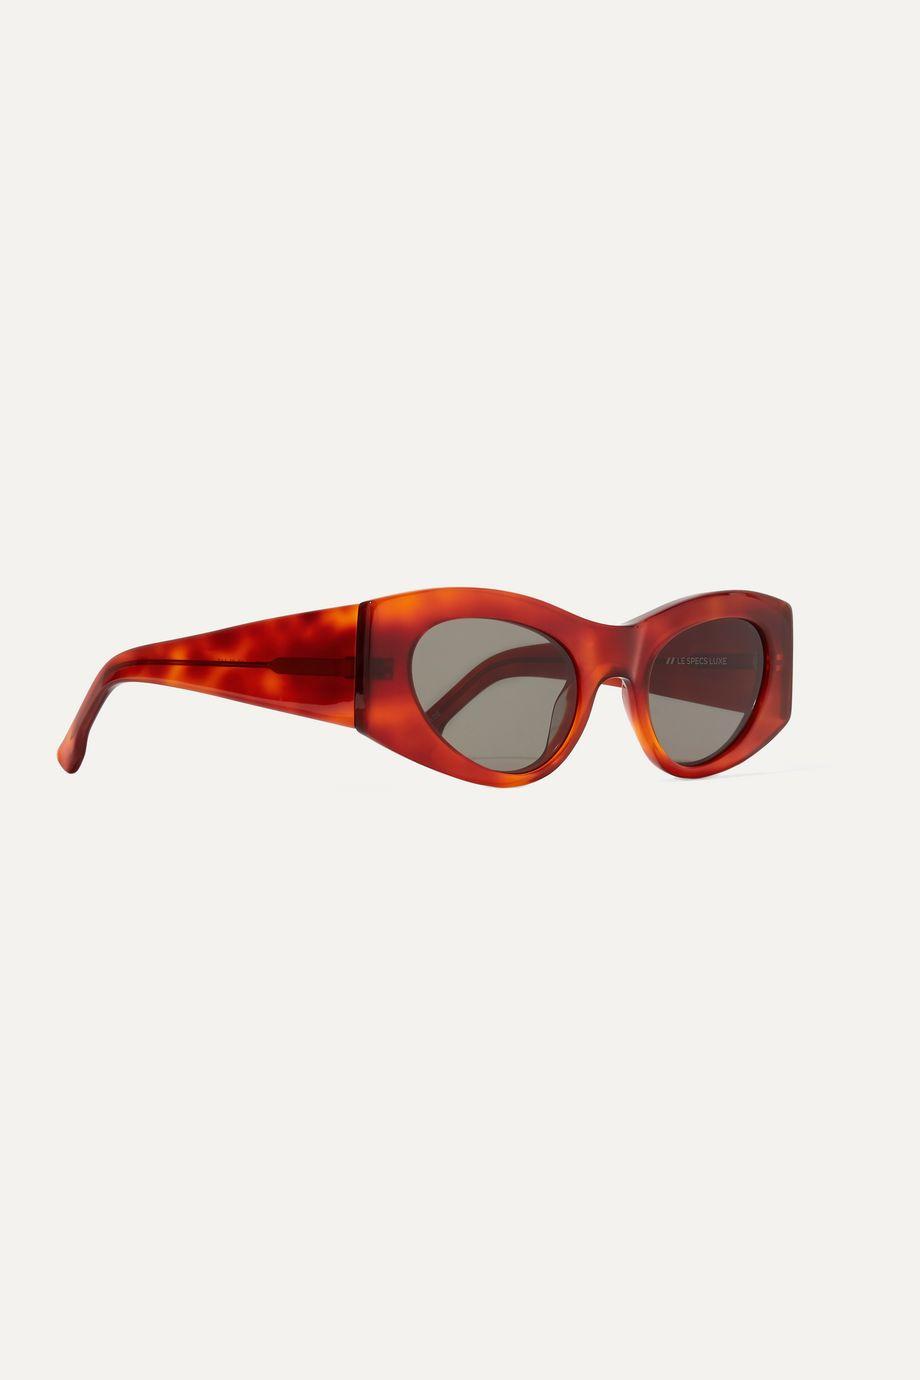 Le Specs Extempore round-frame acetate sunglasses